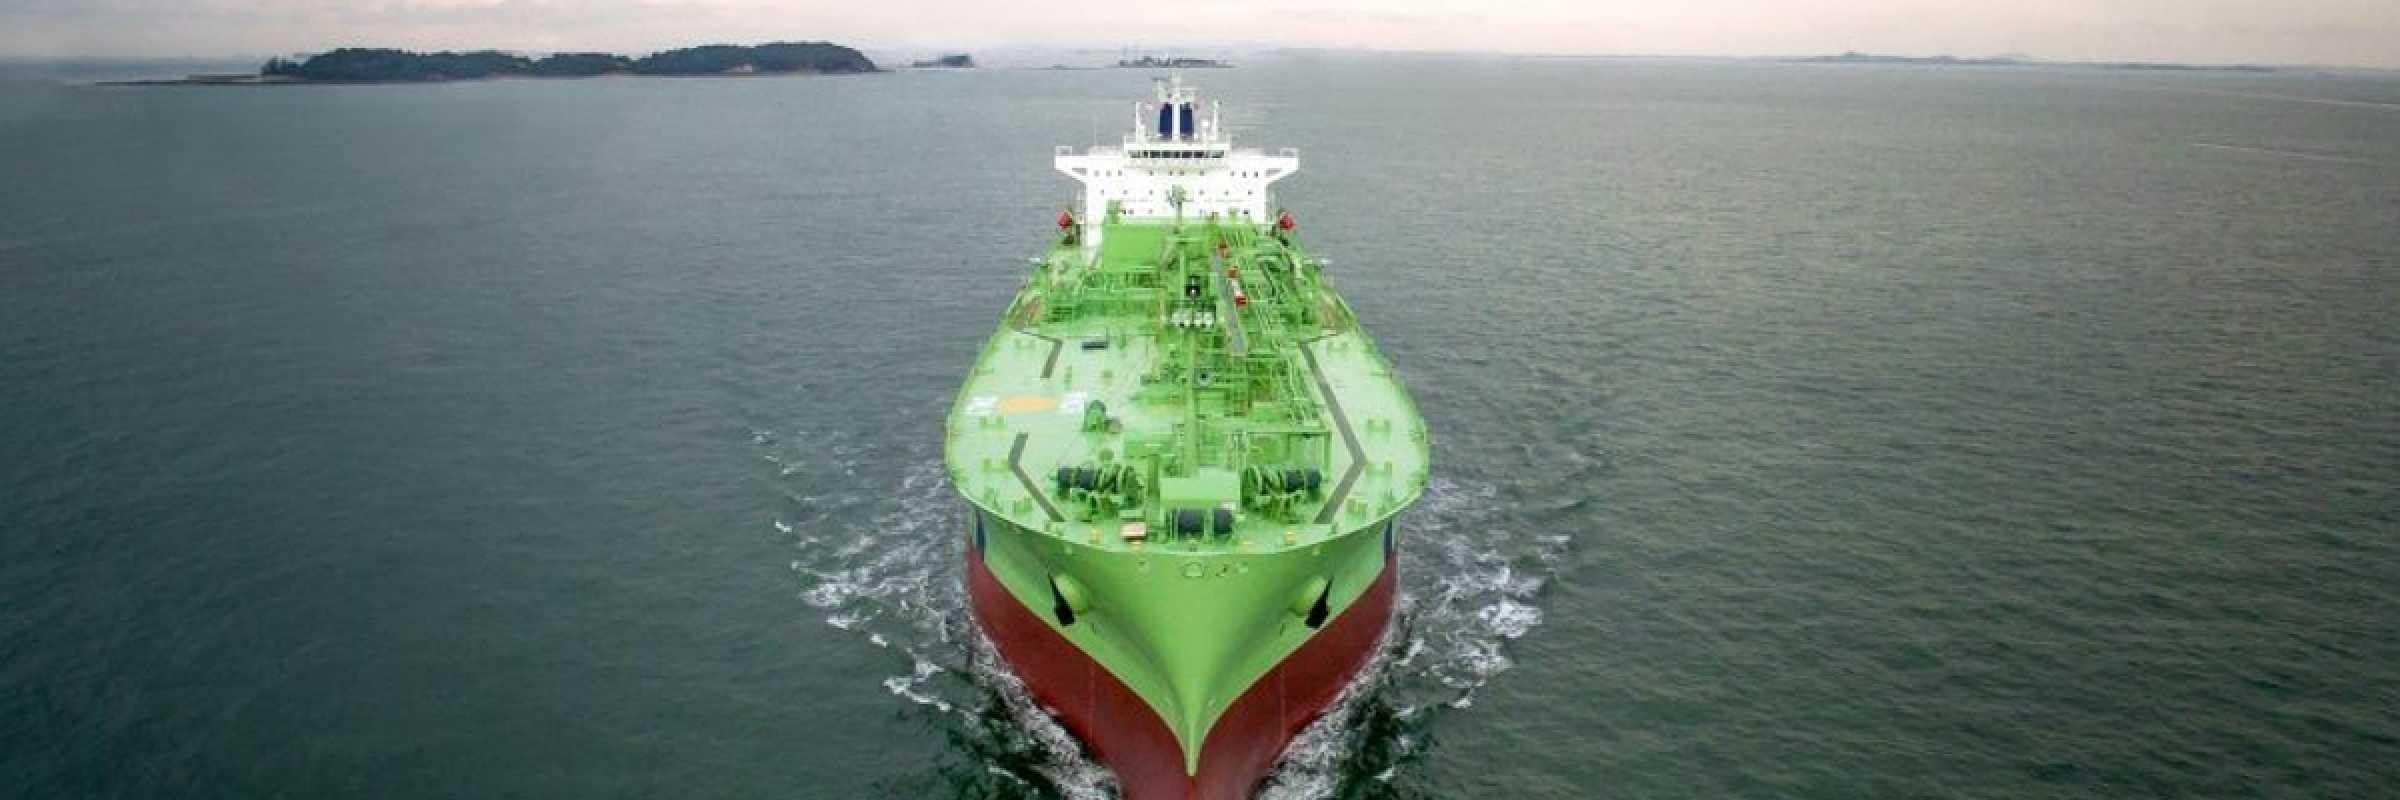 BW LPG opts for more dual-fuel retrofits